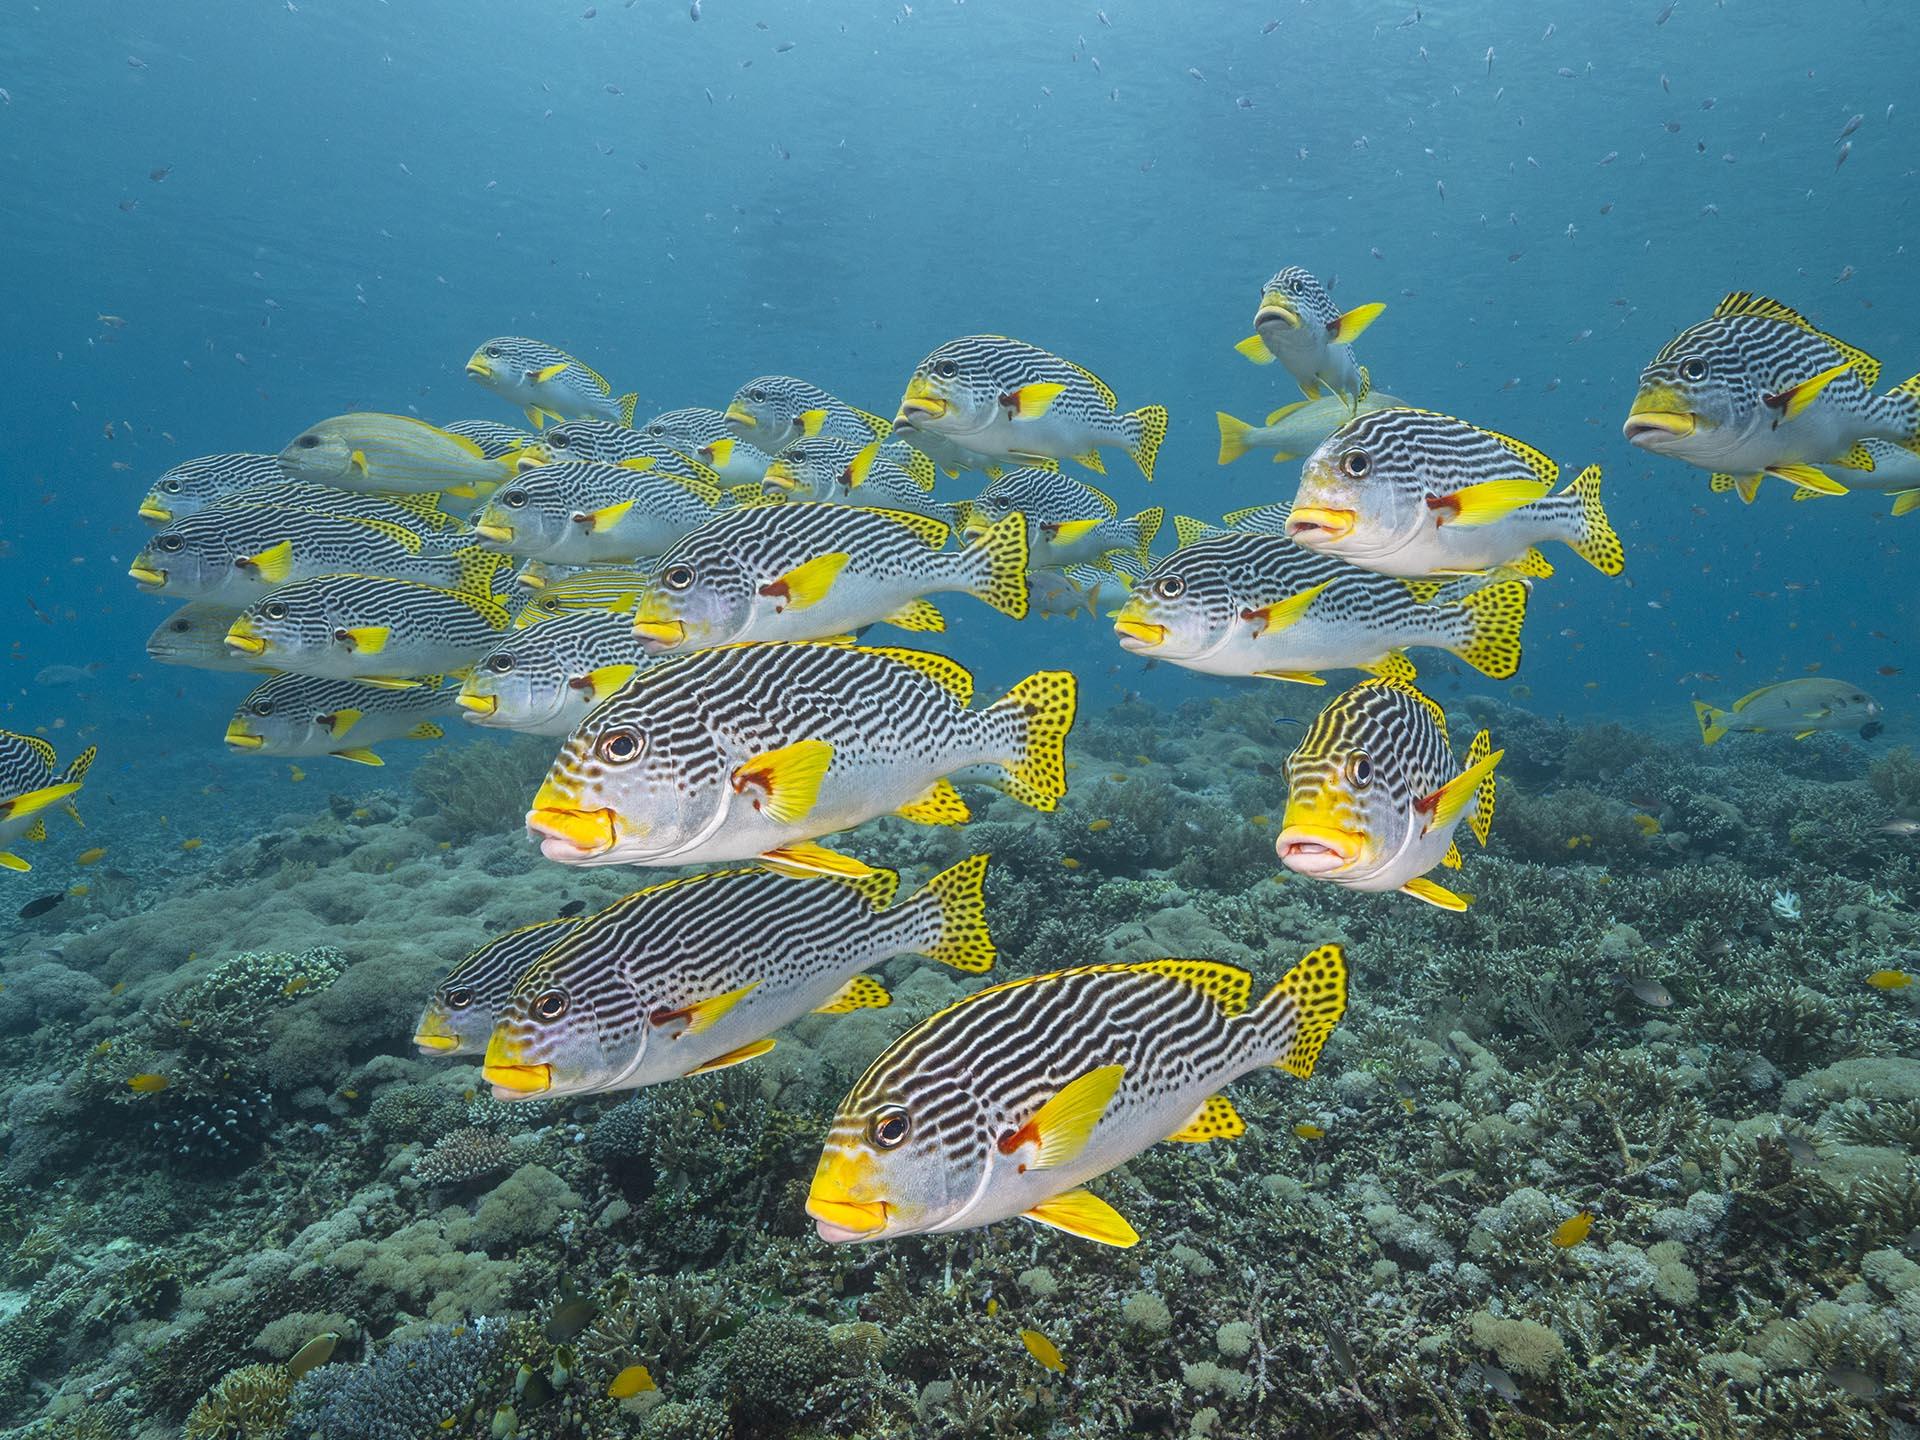 sweetlips over hard coral reef